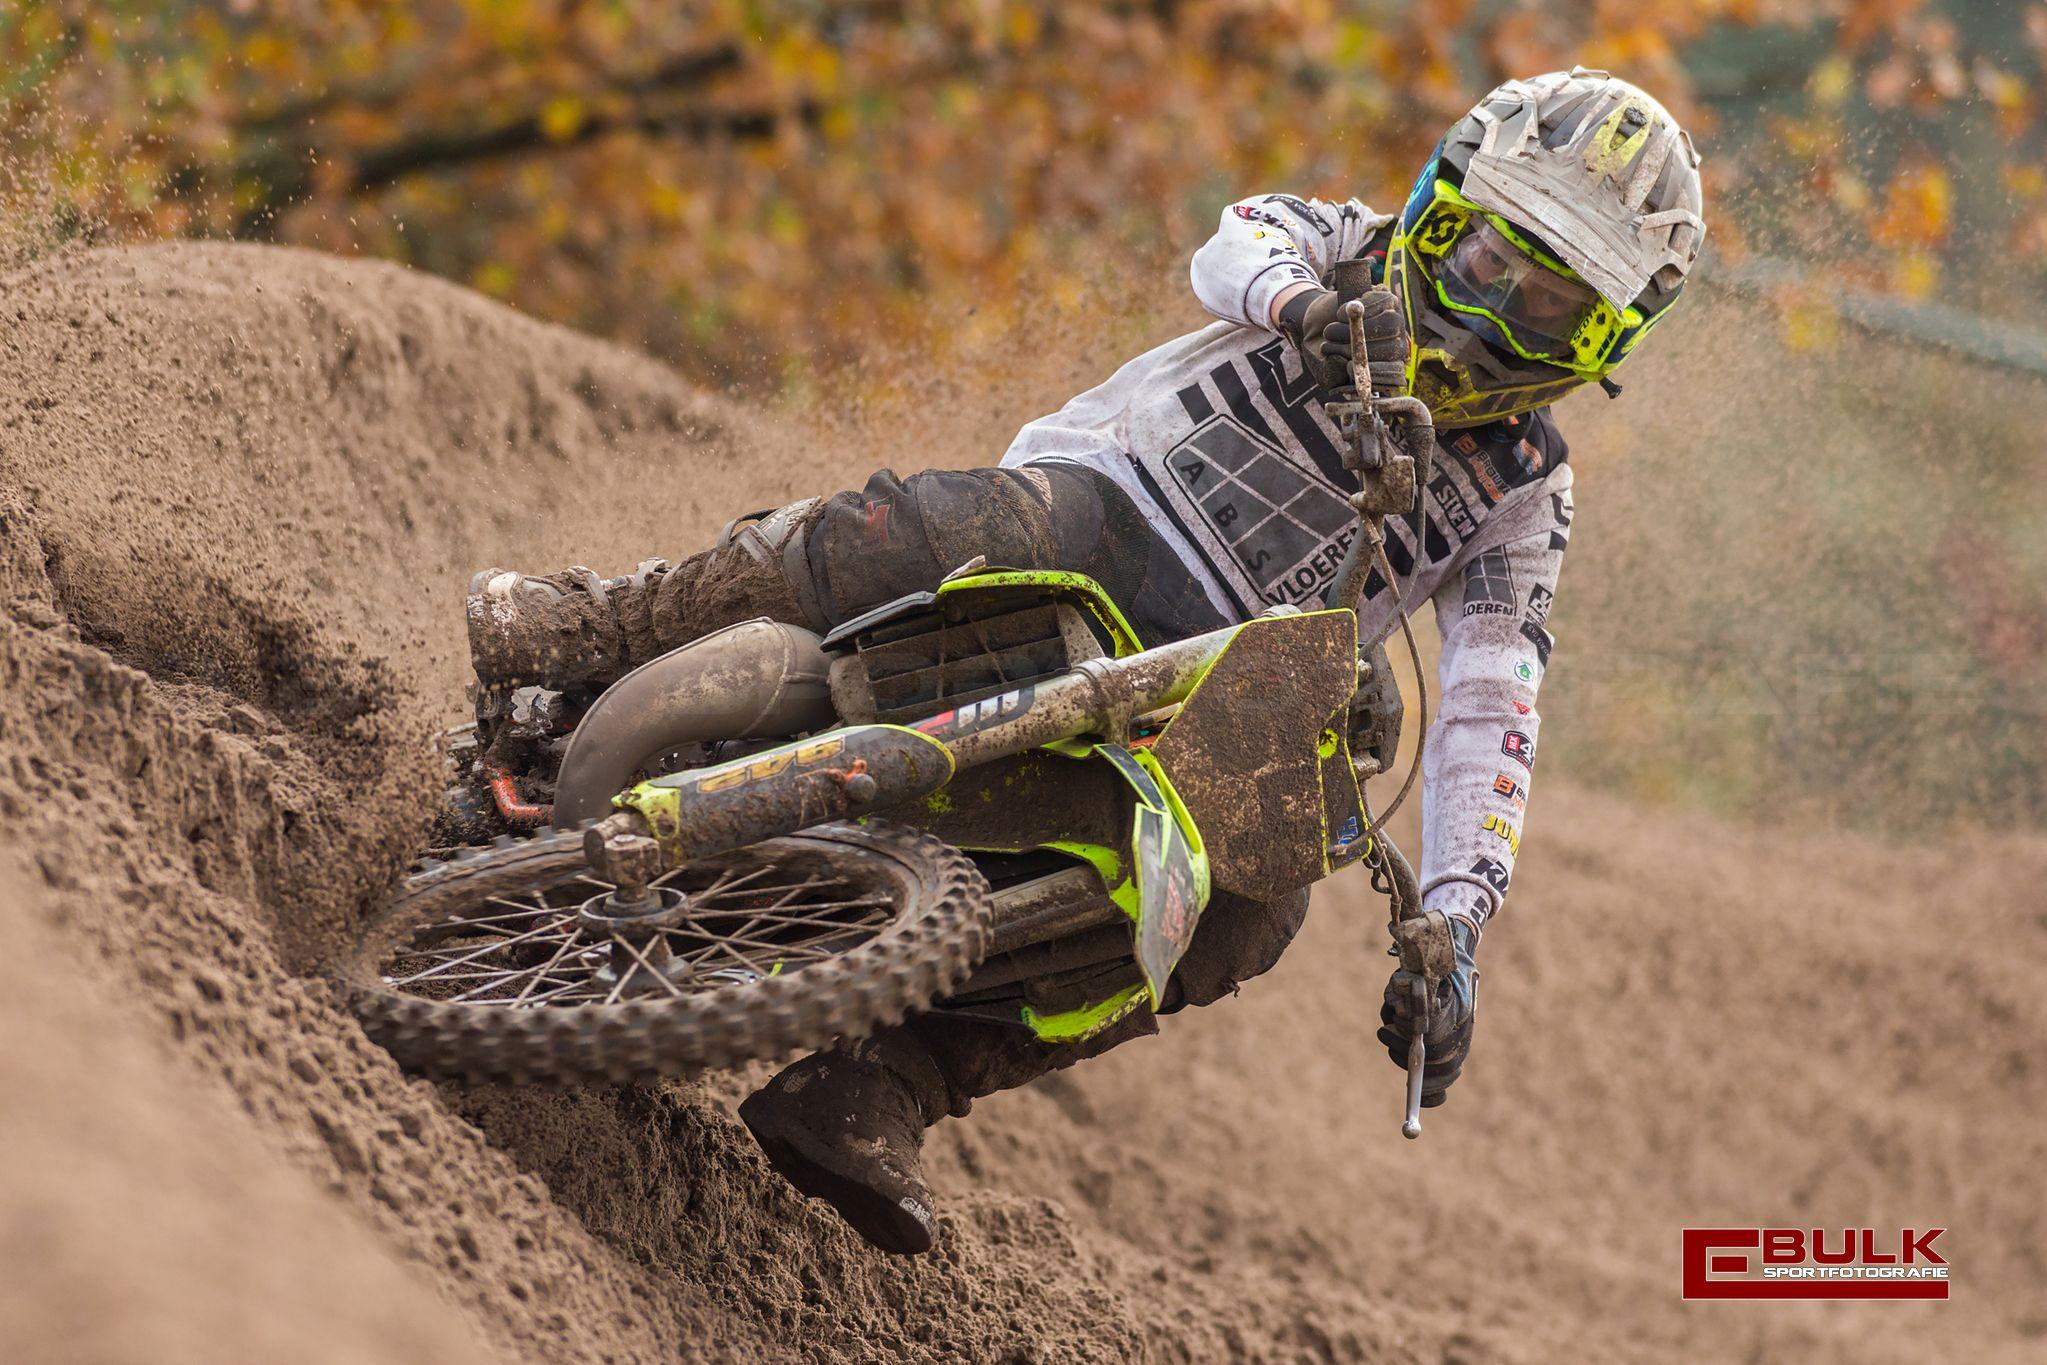 eebs1346-ed_bulk_sportfotografie